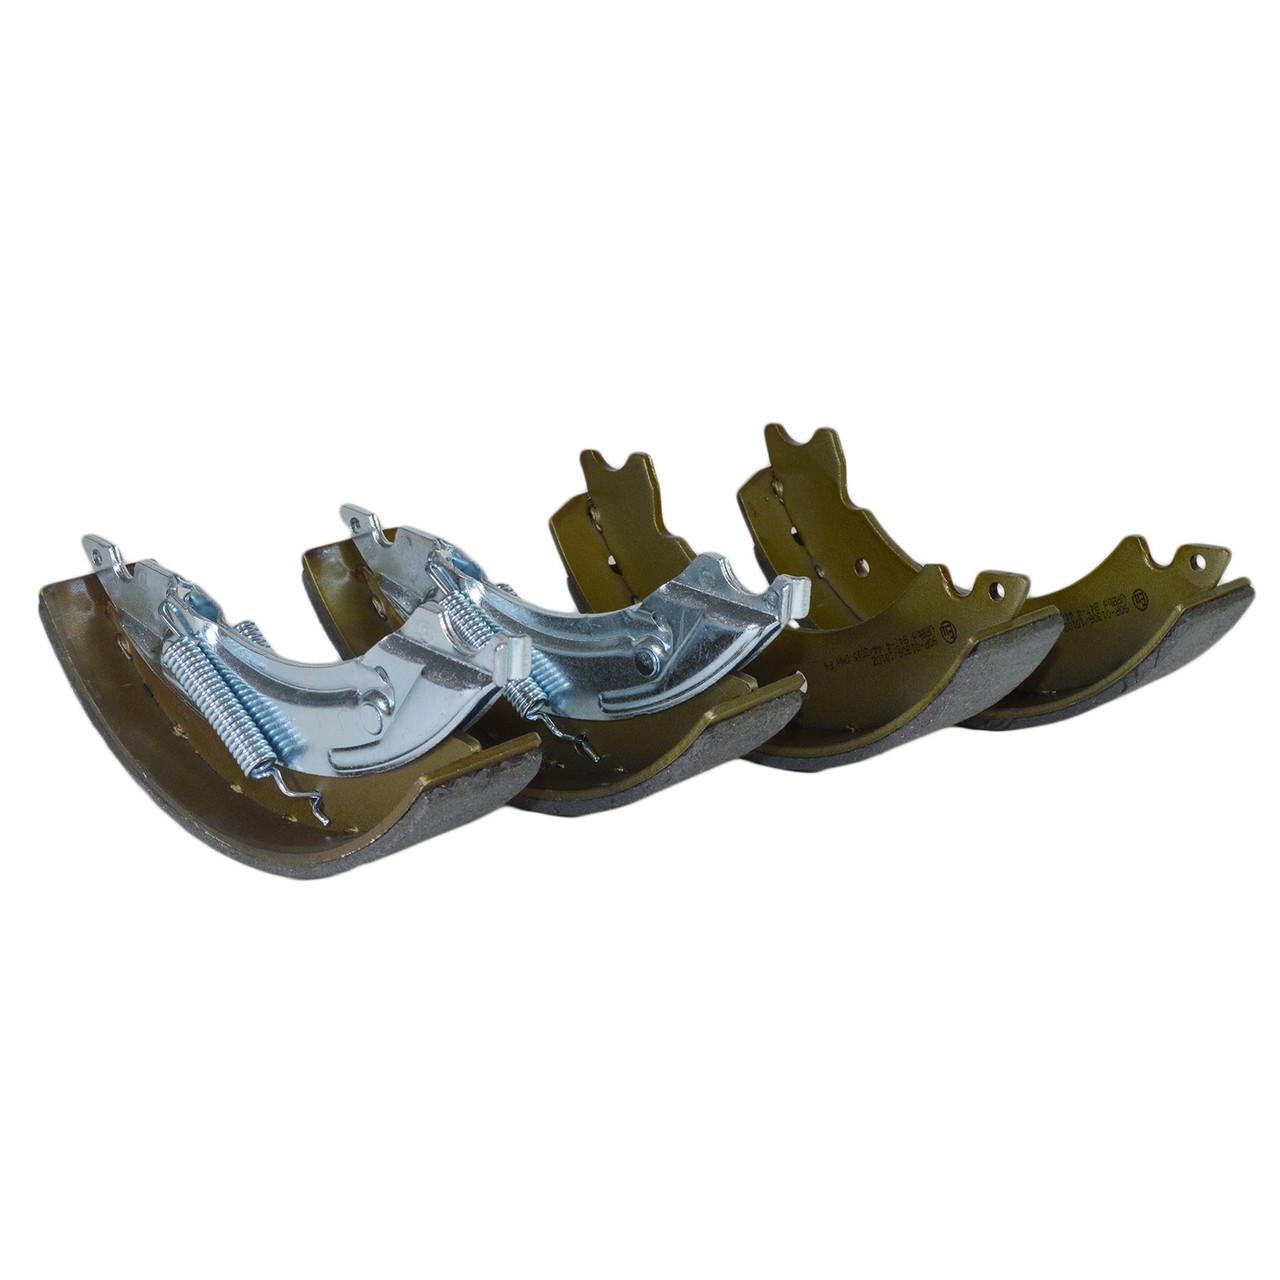 Capricornleo Trailer Brake Shoe Replacements Spring Kit 203mm x 40mm KNOTT Style Axles